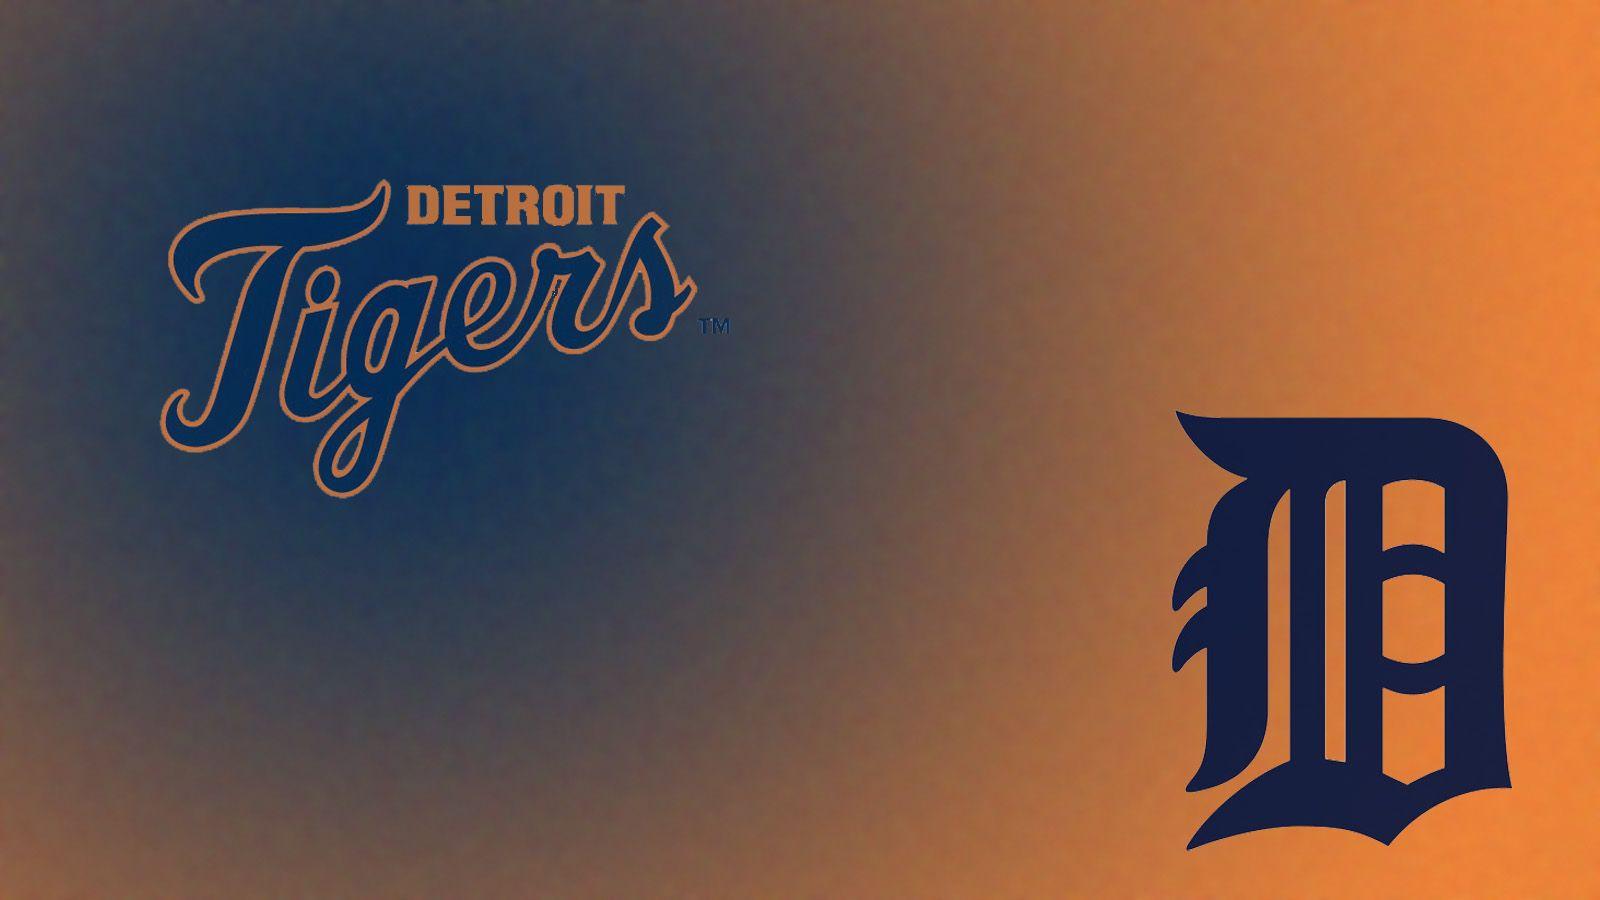 Detroit Tigers Desktop Wallpaper related wallpapers